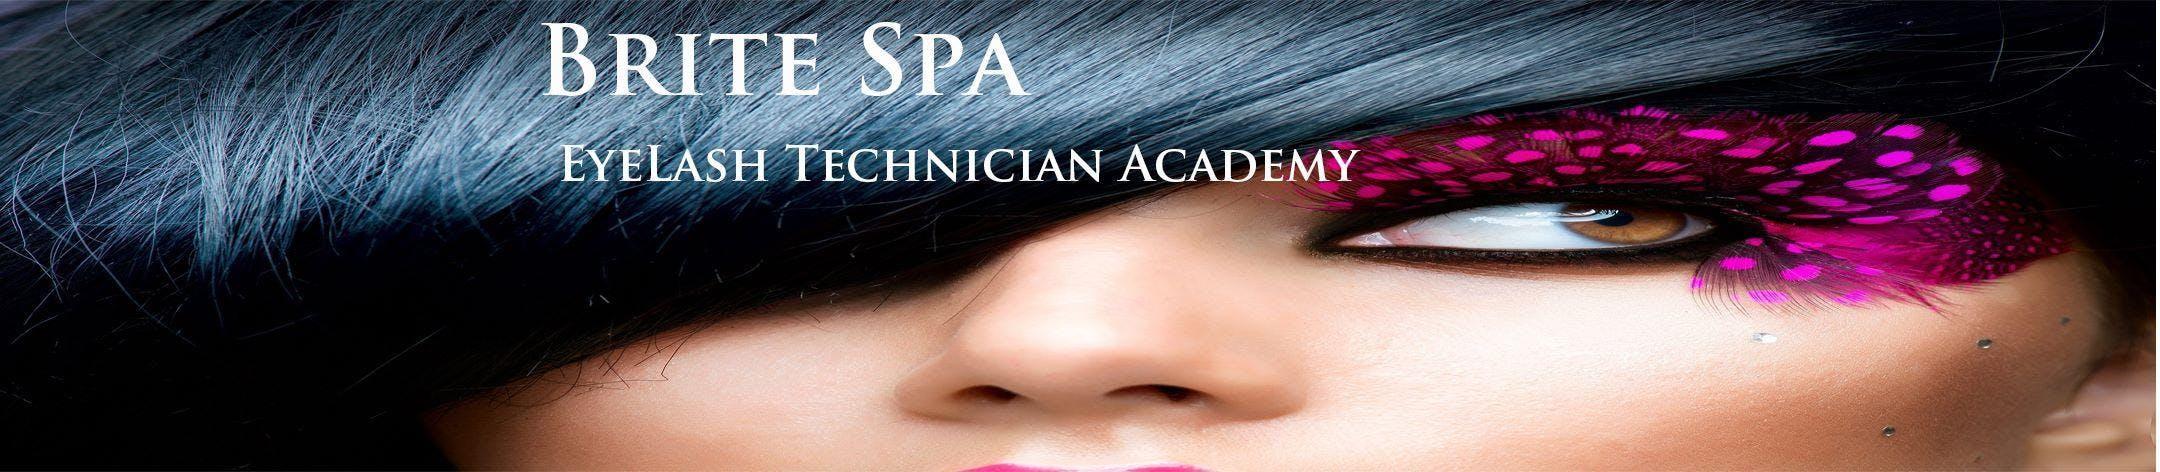 1 SPOT LEFT - ONLY $497! Monday, Sept. 24th Eyelash Extension Certification (Scottsdale/Phoenix, AZ)